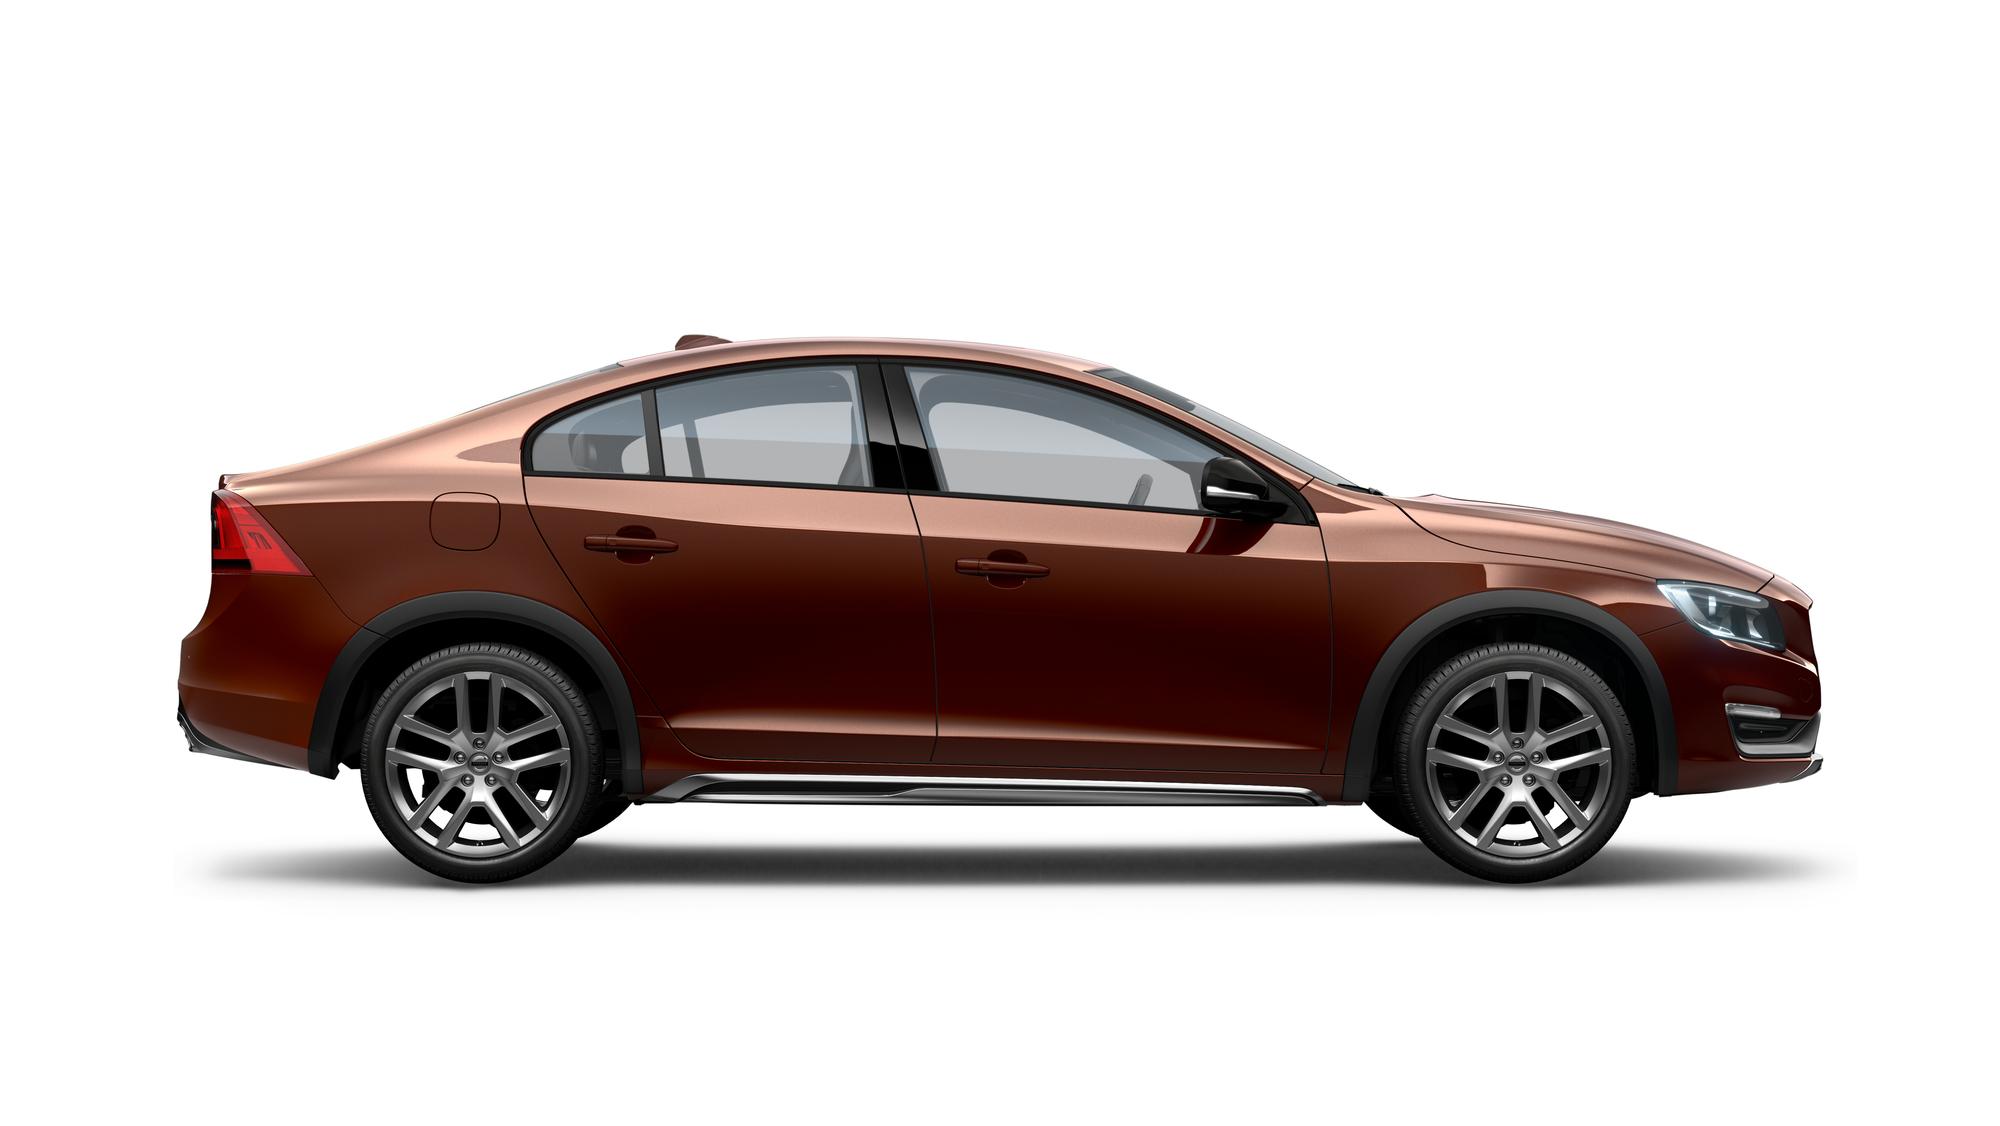 European Motors Volvo Home 2019 2020 Car Release Date